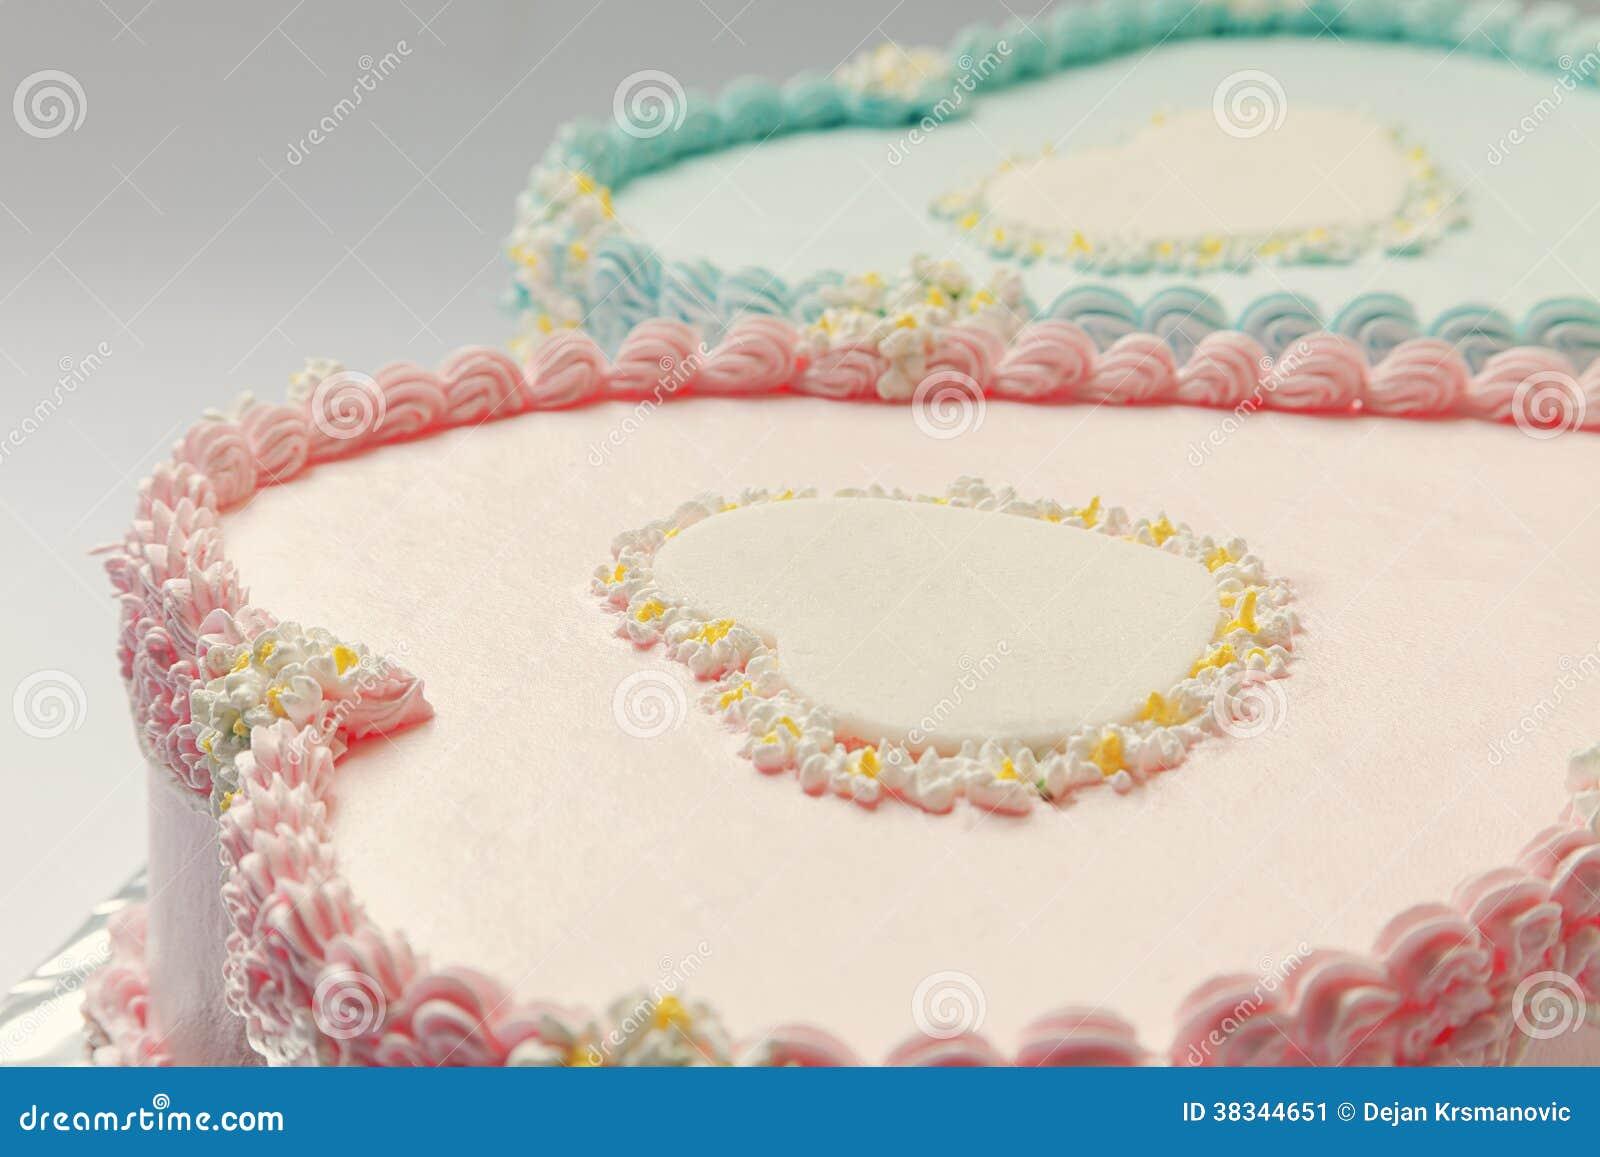 Astounding Birthday Cakes Stock Image Image Of Cream Food Childhood 38344651 Funny Birthday Cards Online Inifodamsfinfo